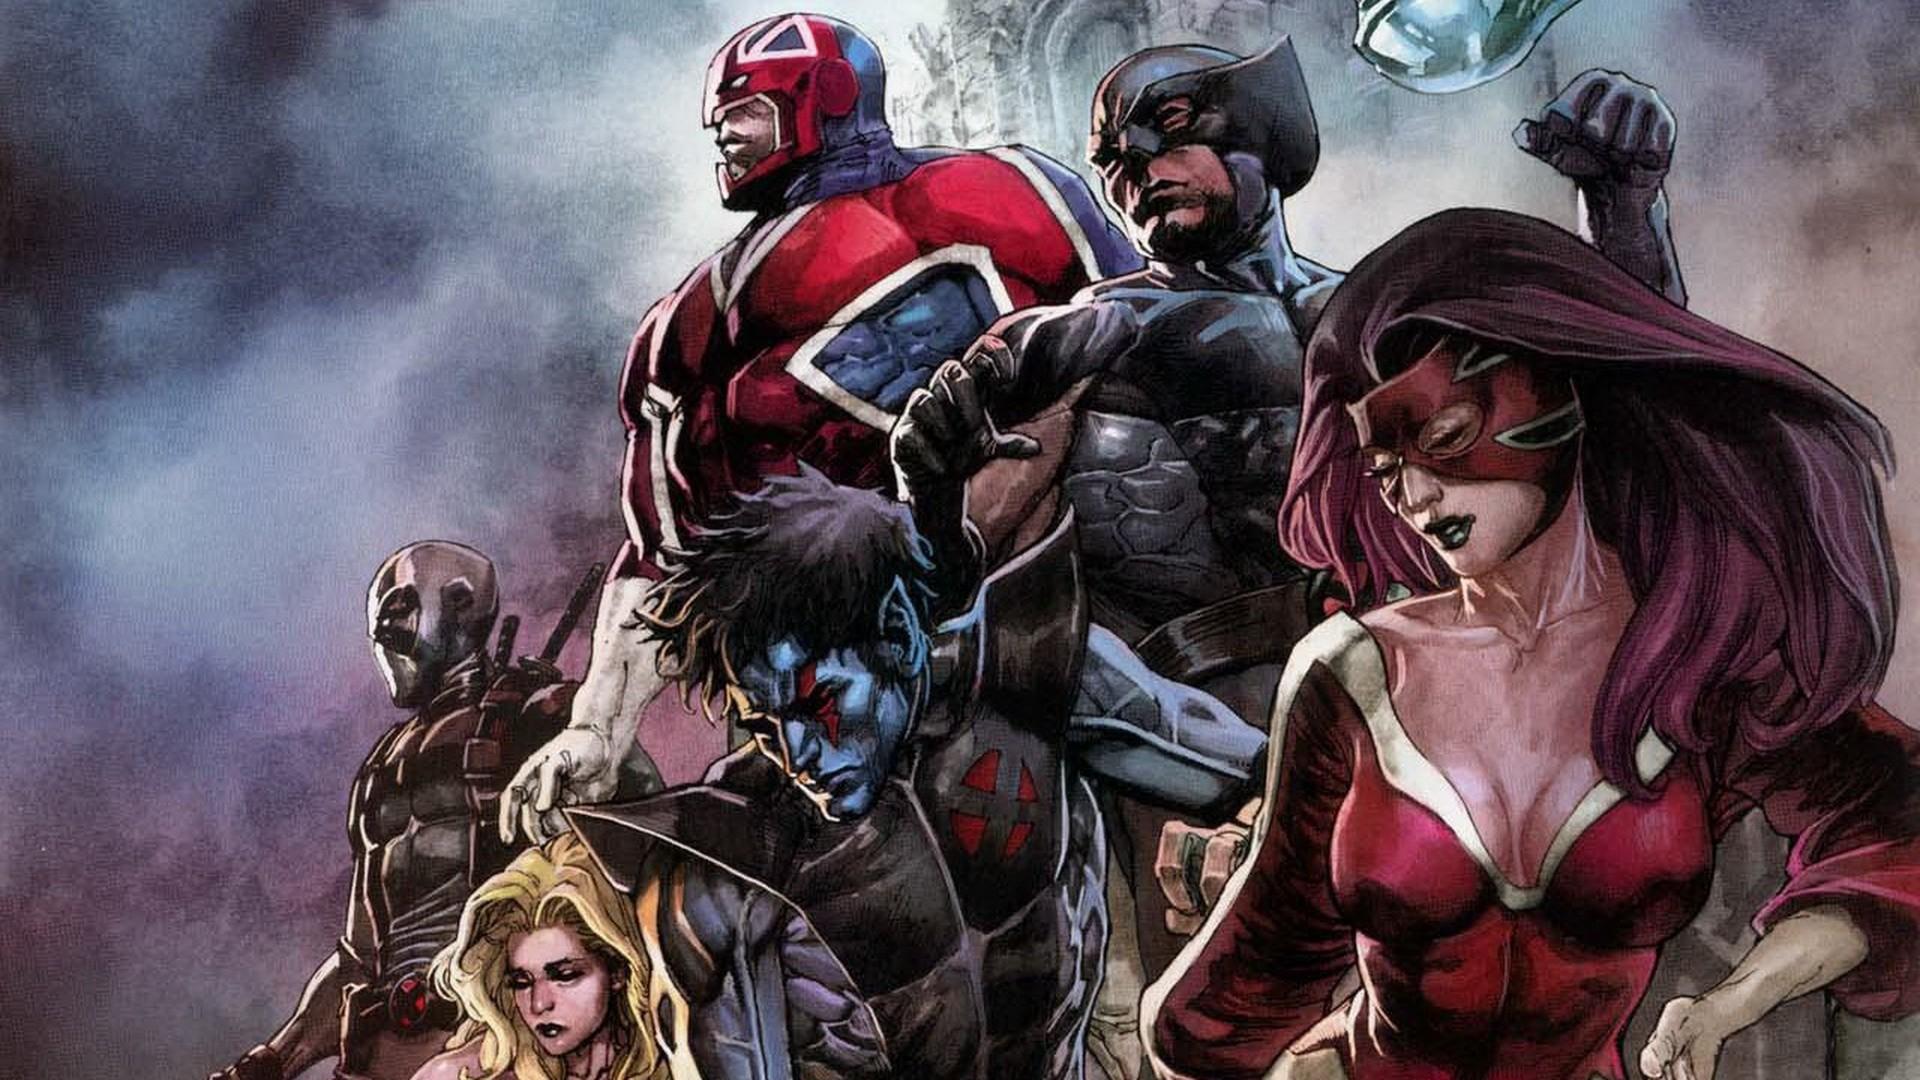 Download Game X-Men Days Of Future Past